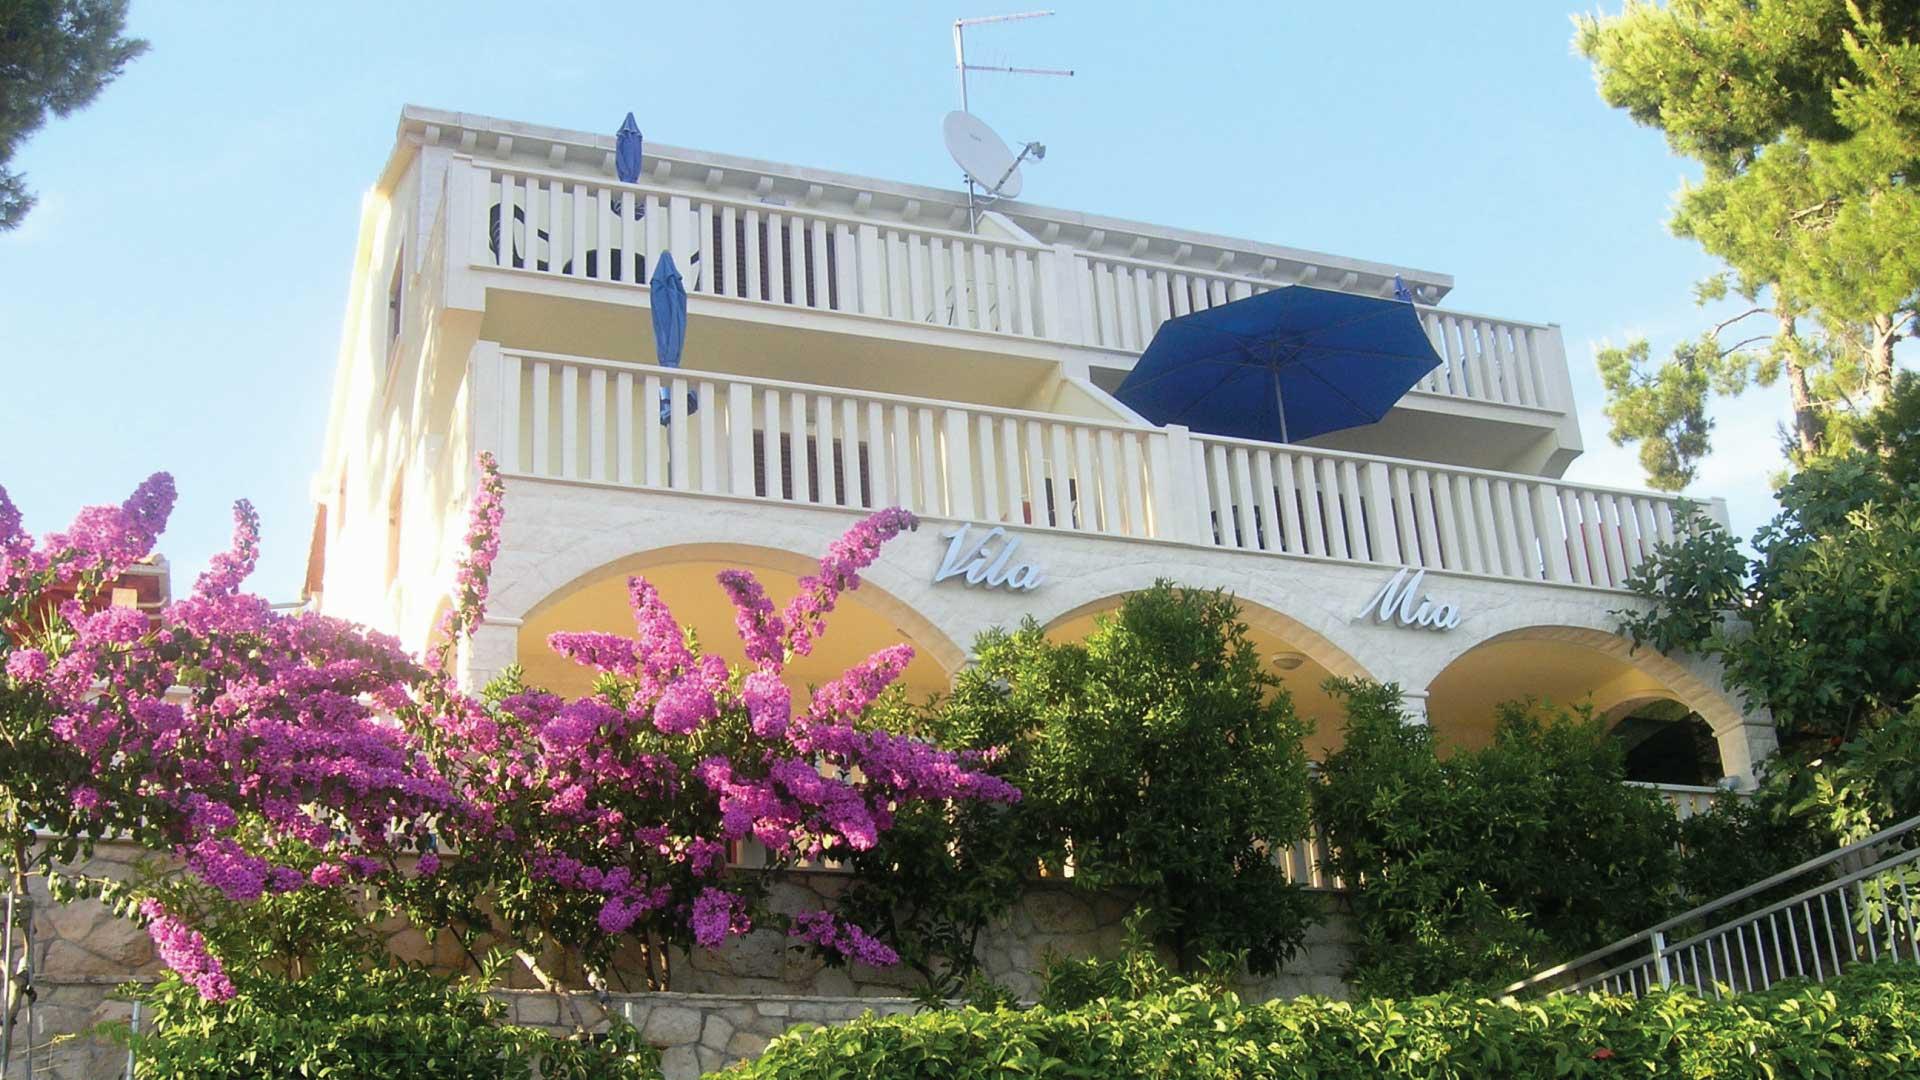 vila-mia-house